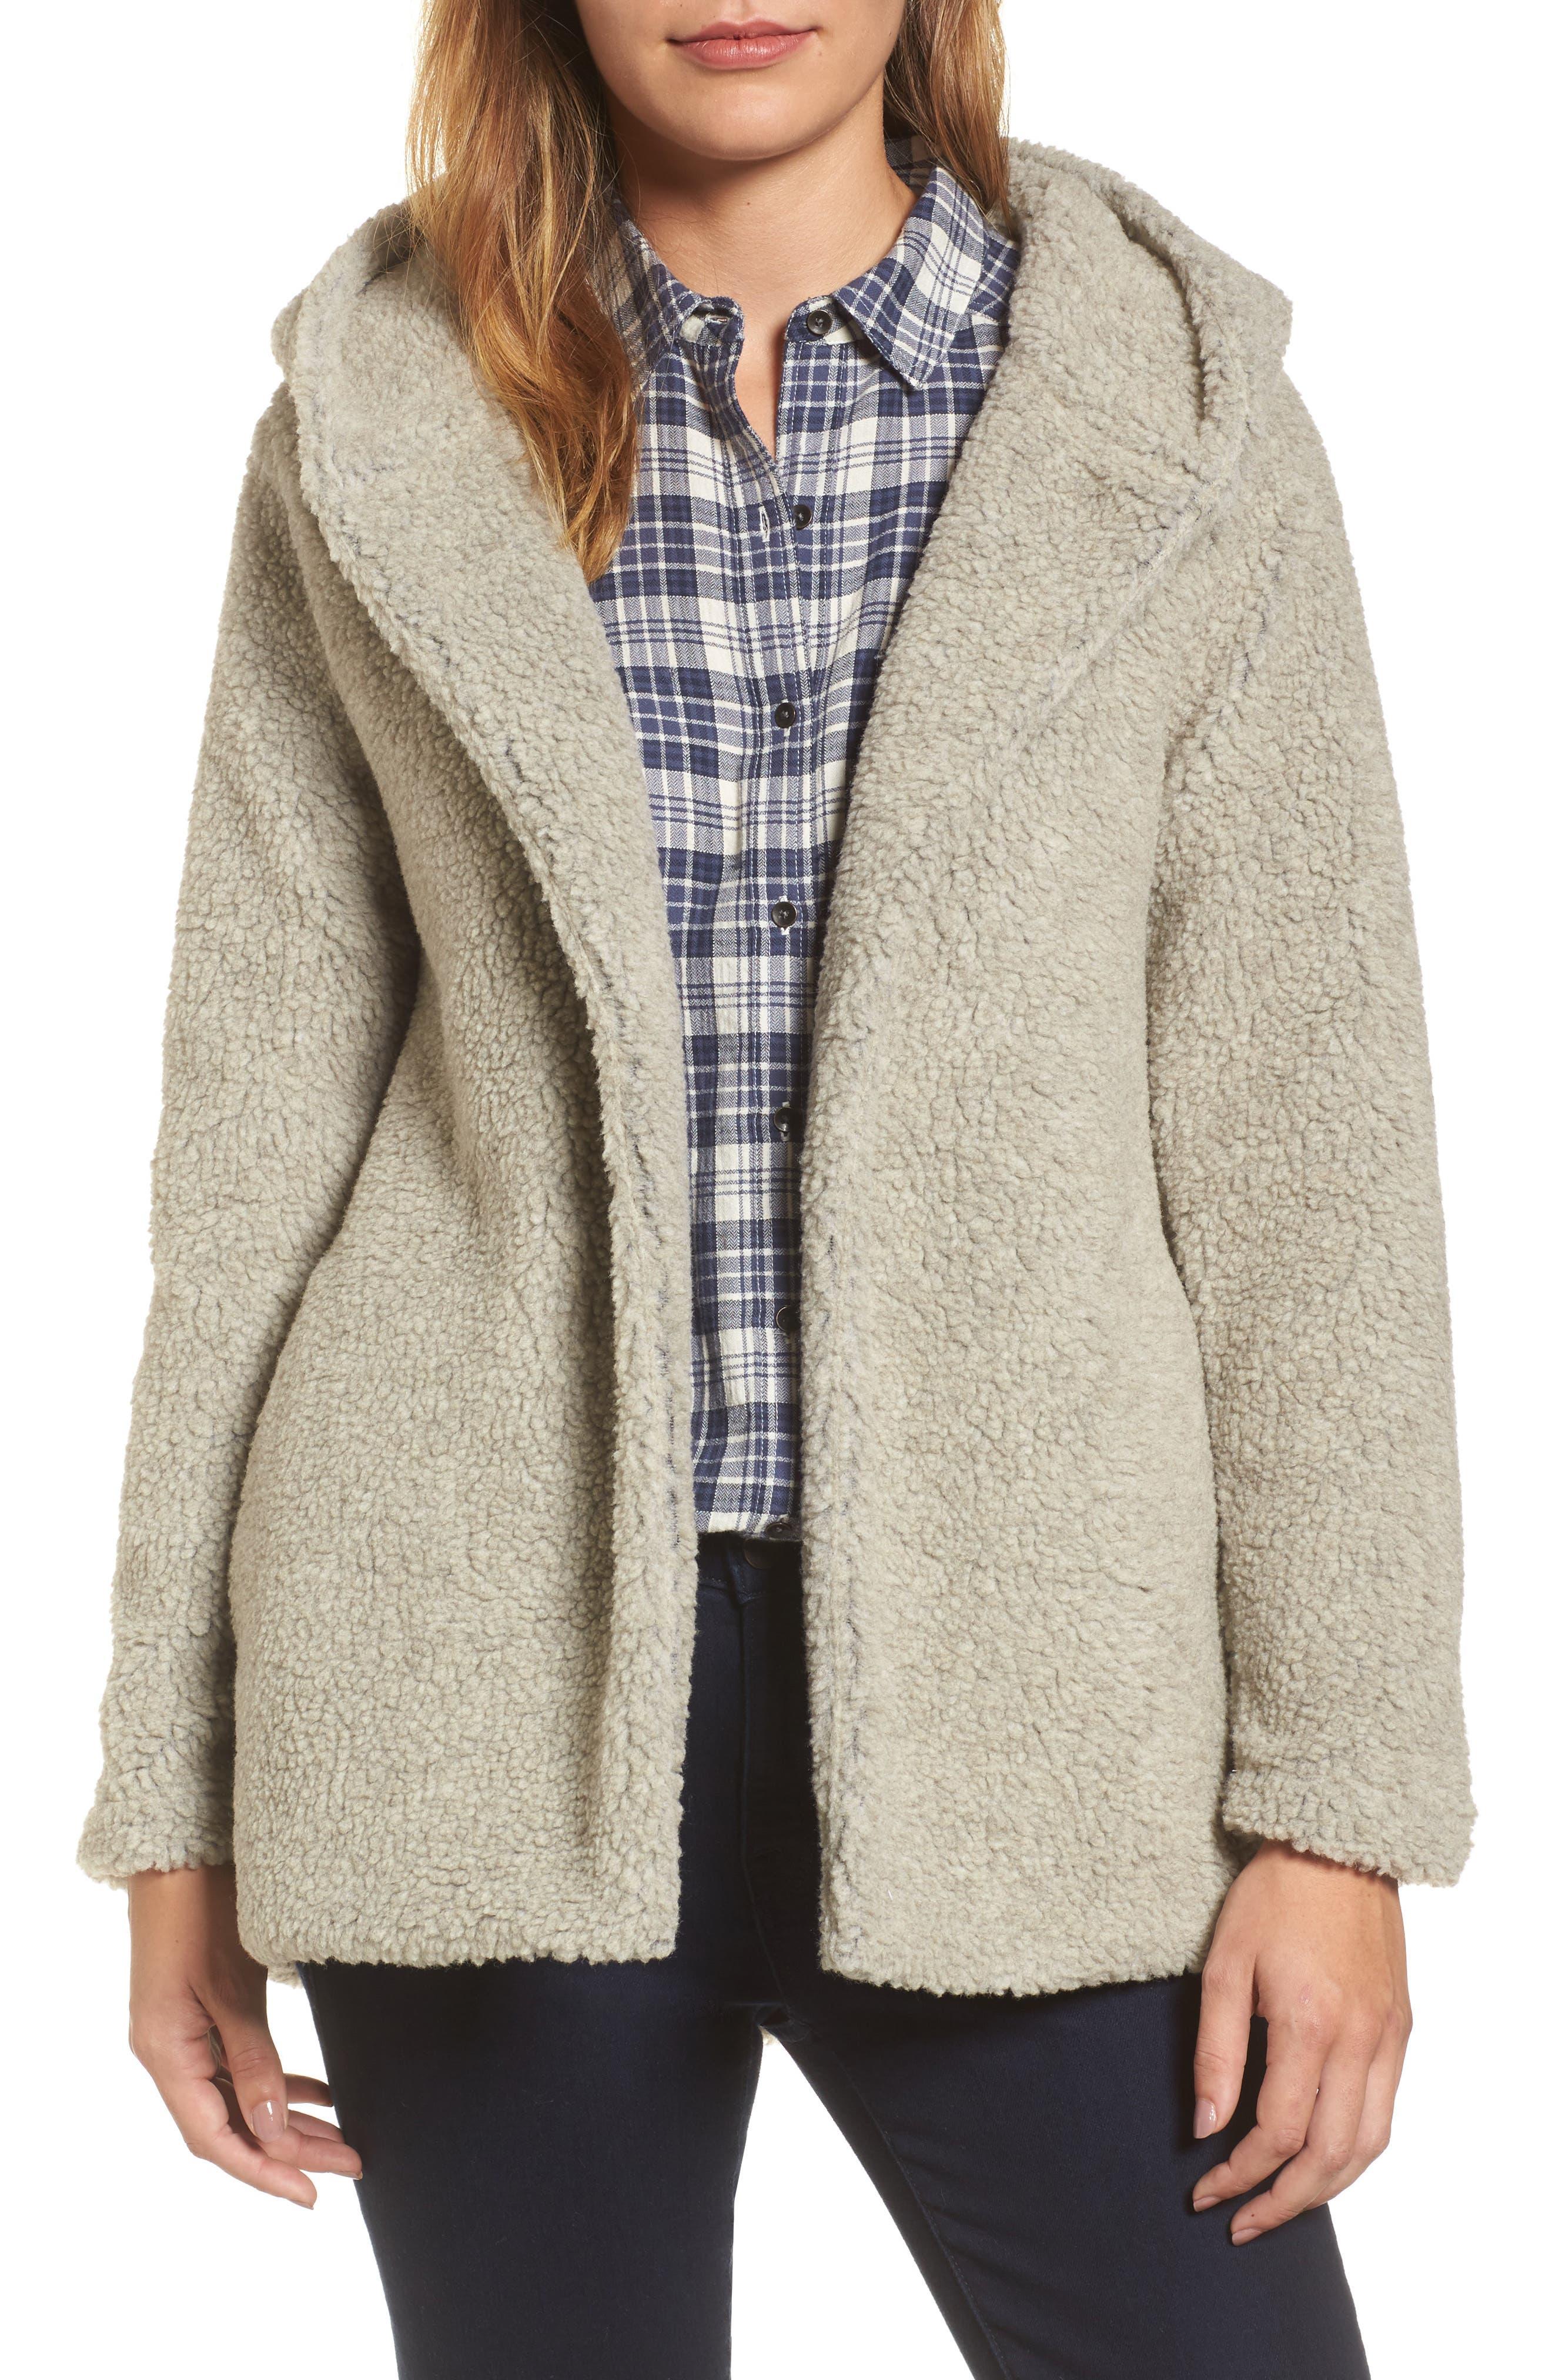 Main Image - Dylan Hooded Faux Fur Jacket